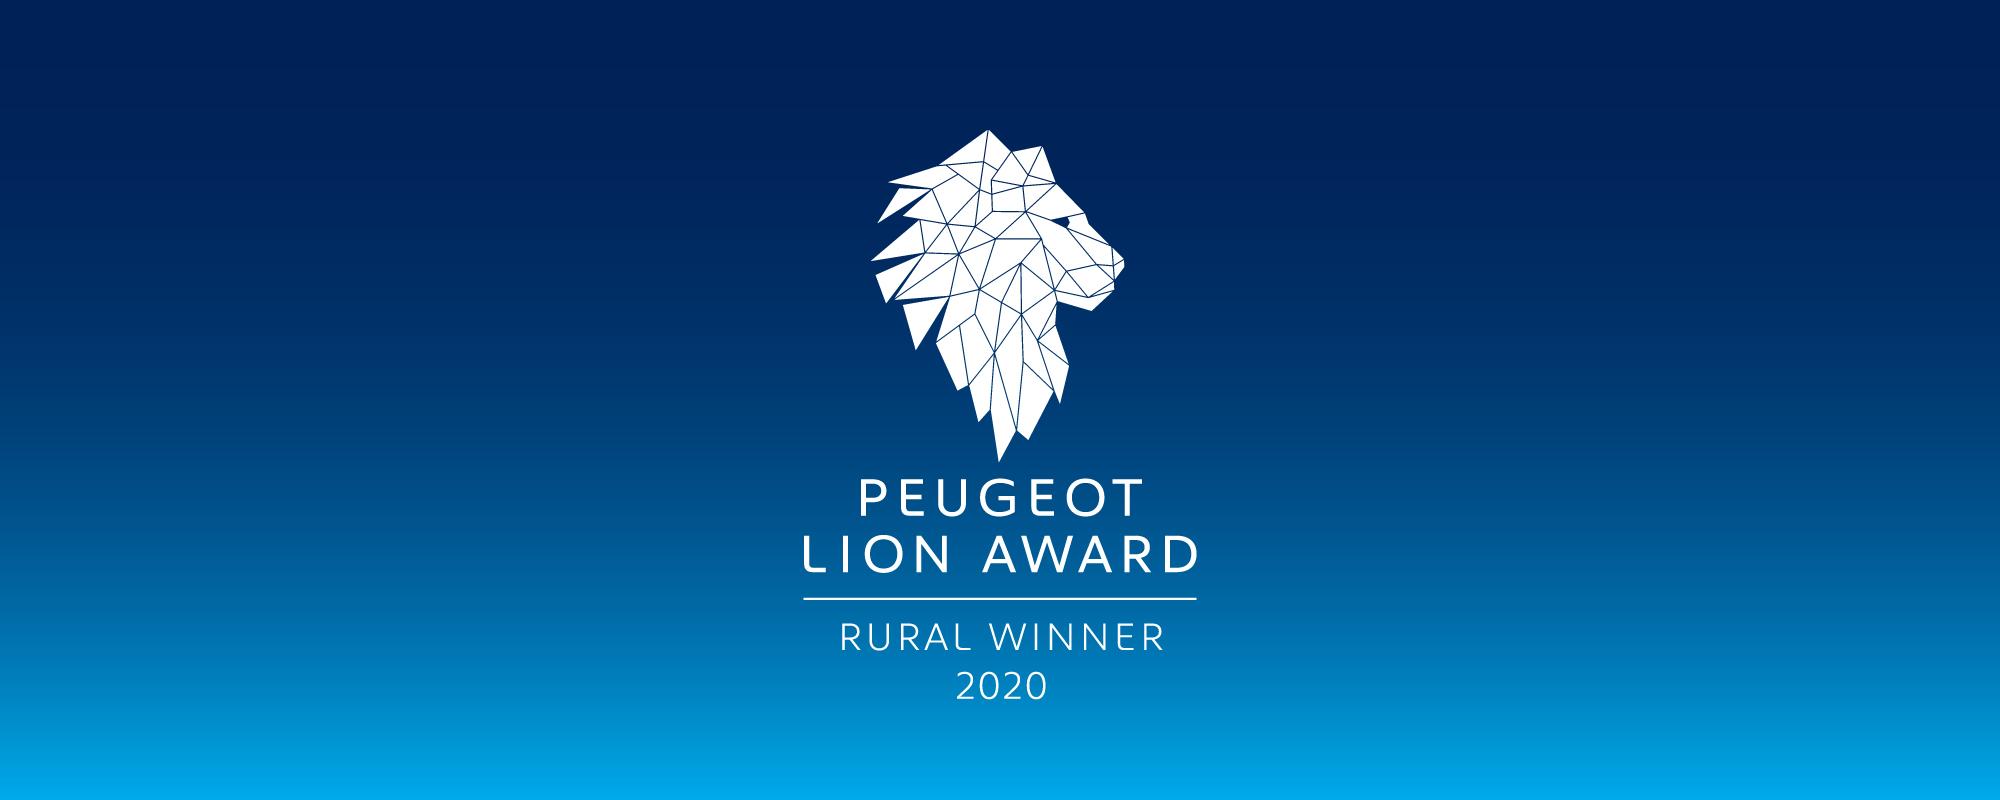 Peugeot Lion2020 2000x800 V02